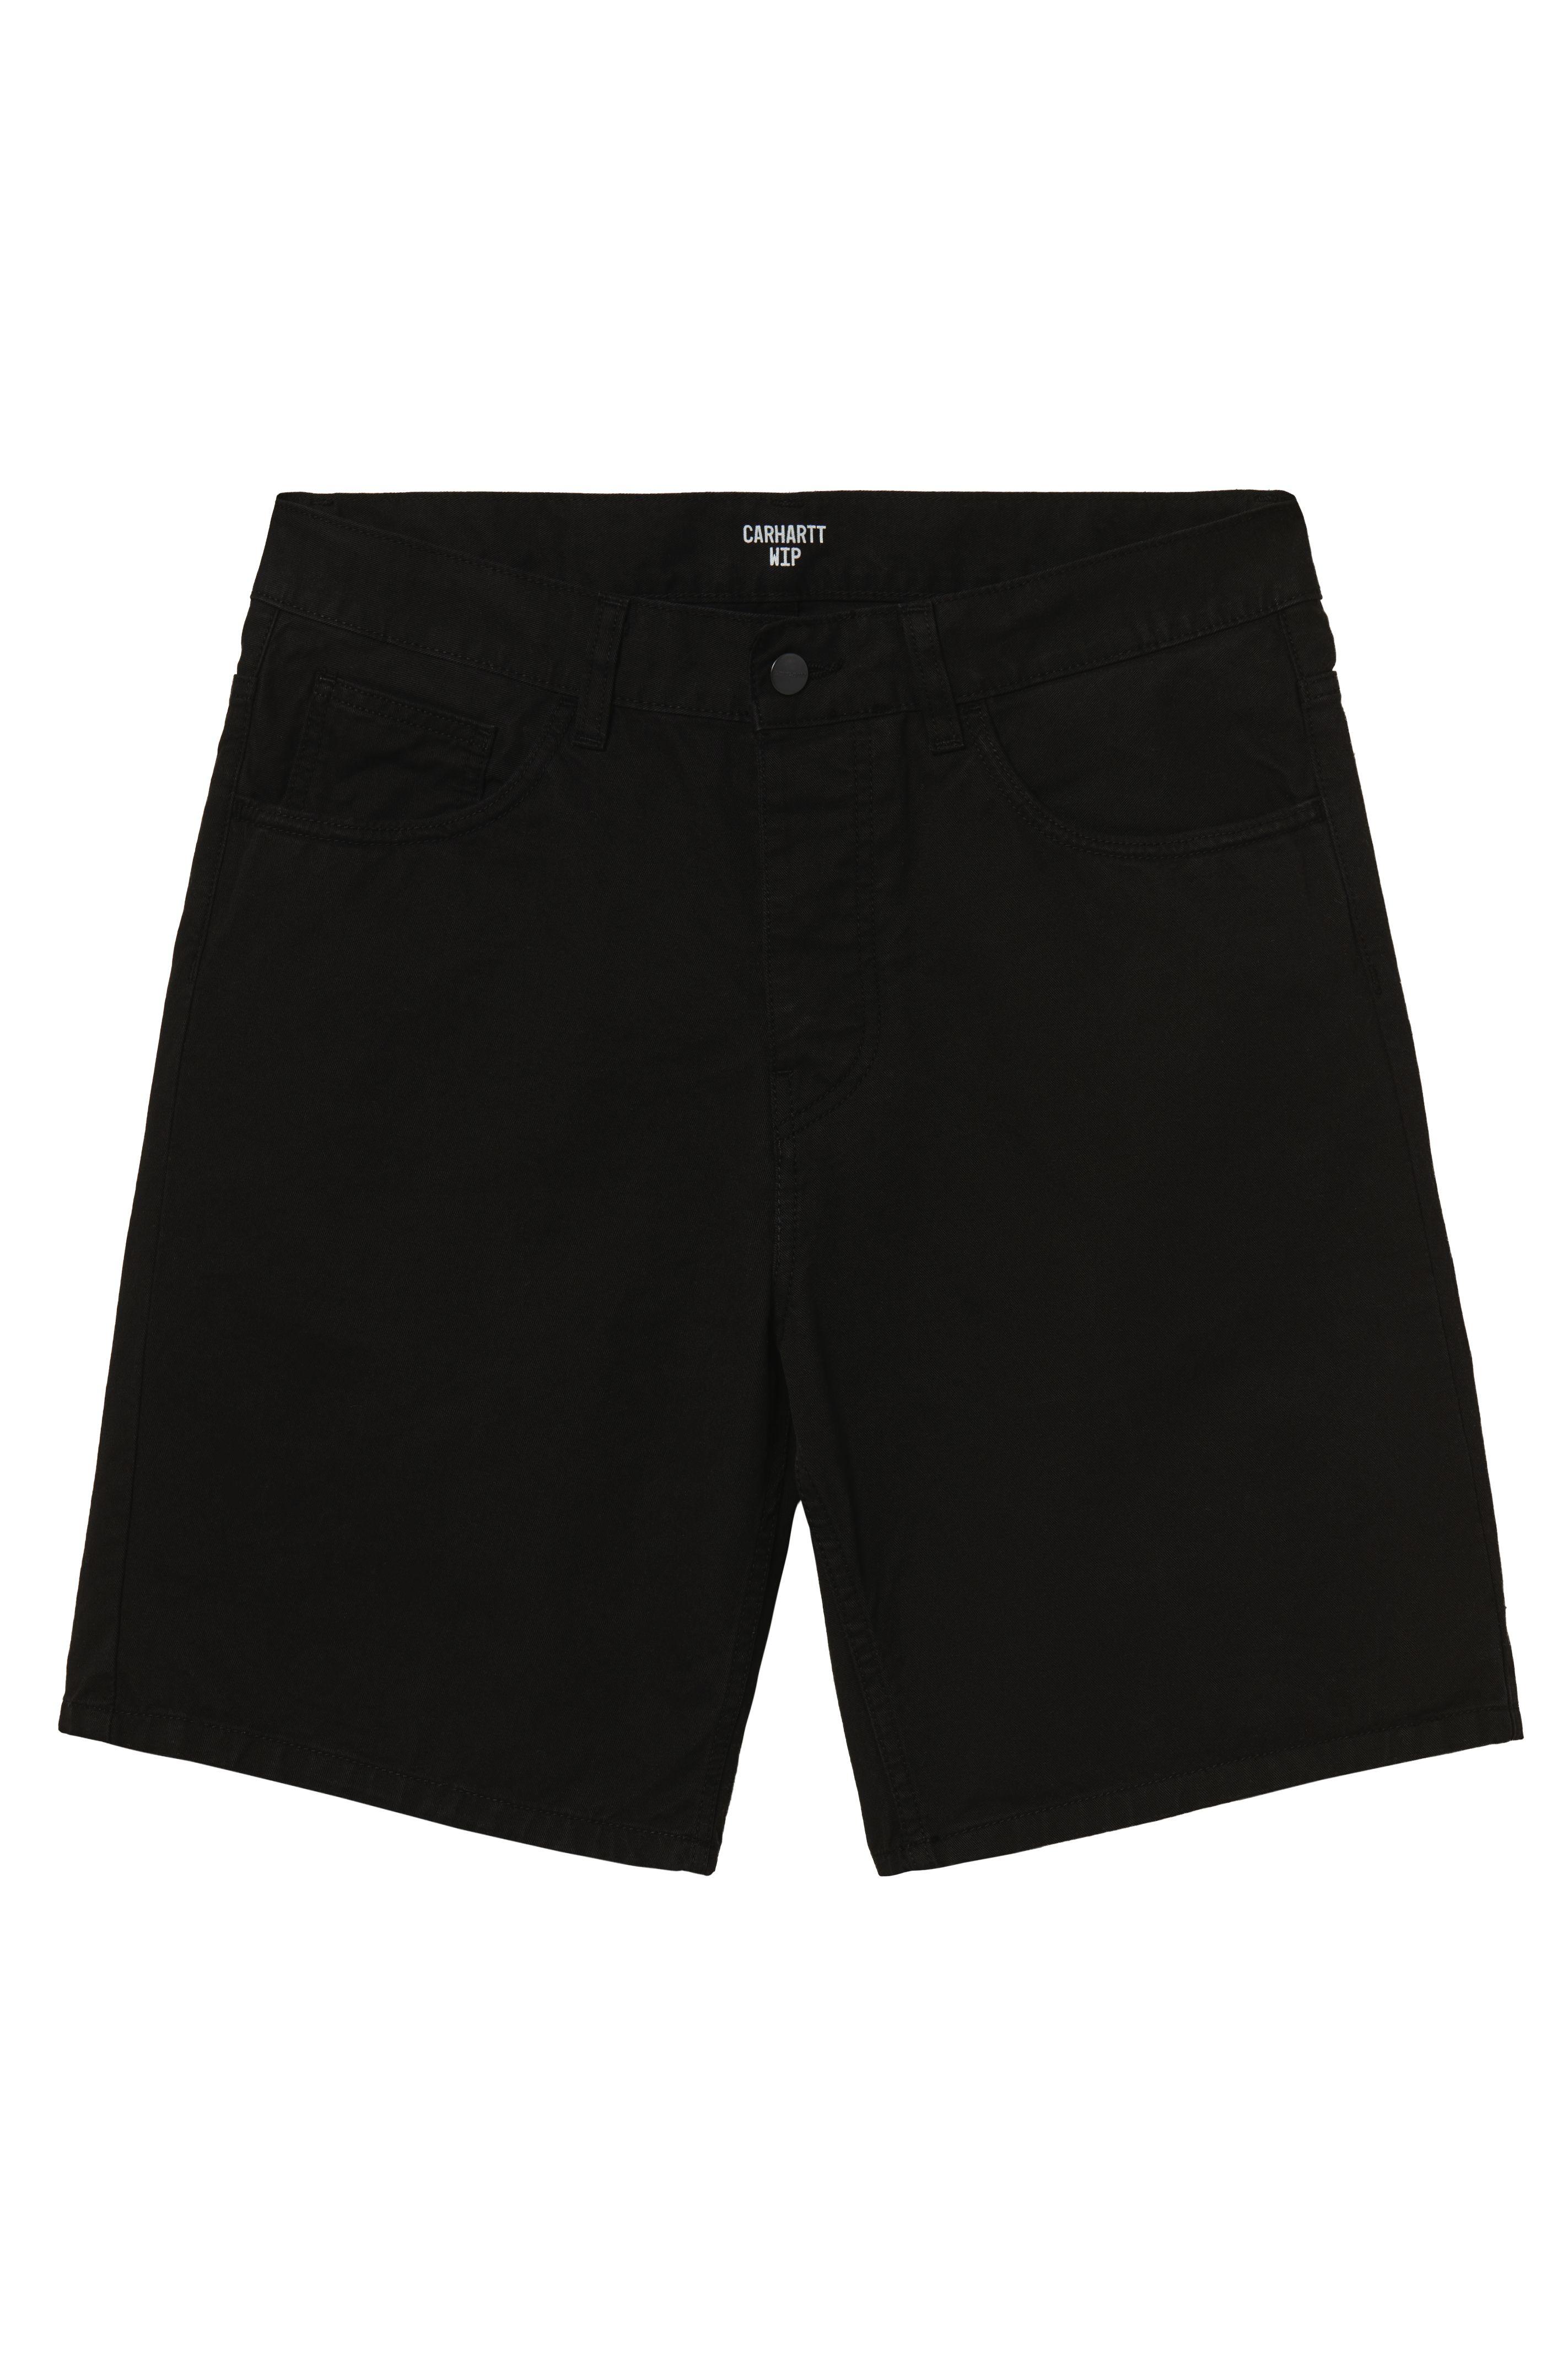 Carhartt WIP Walkshorts NEWEL SHORT Black